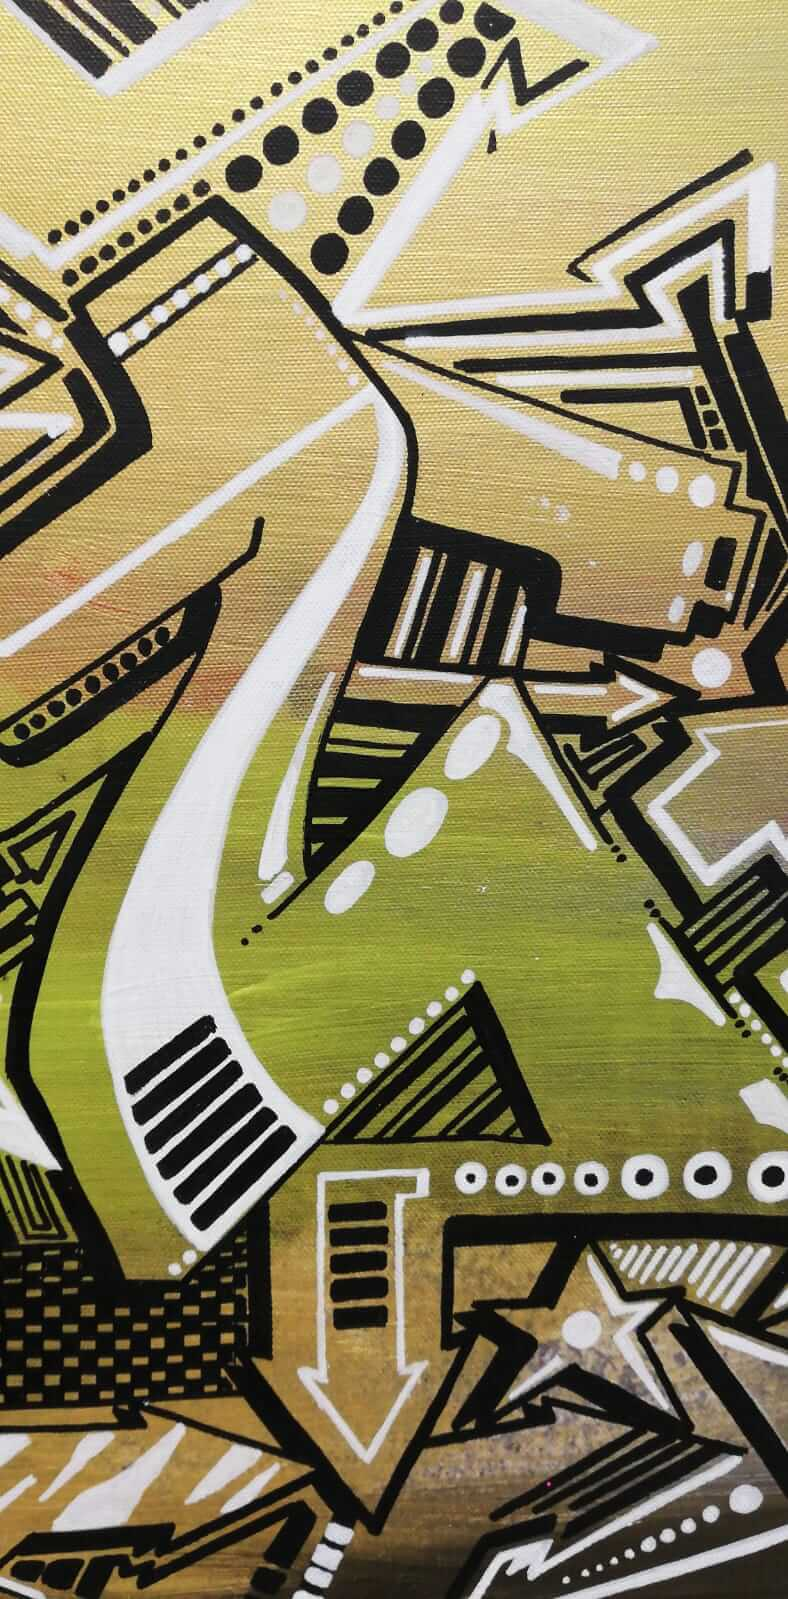 exposicion de graffity mets